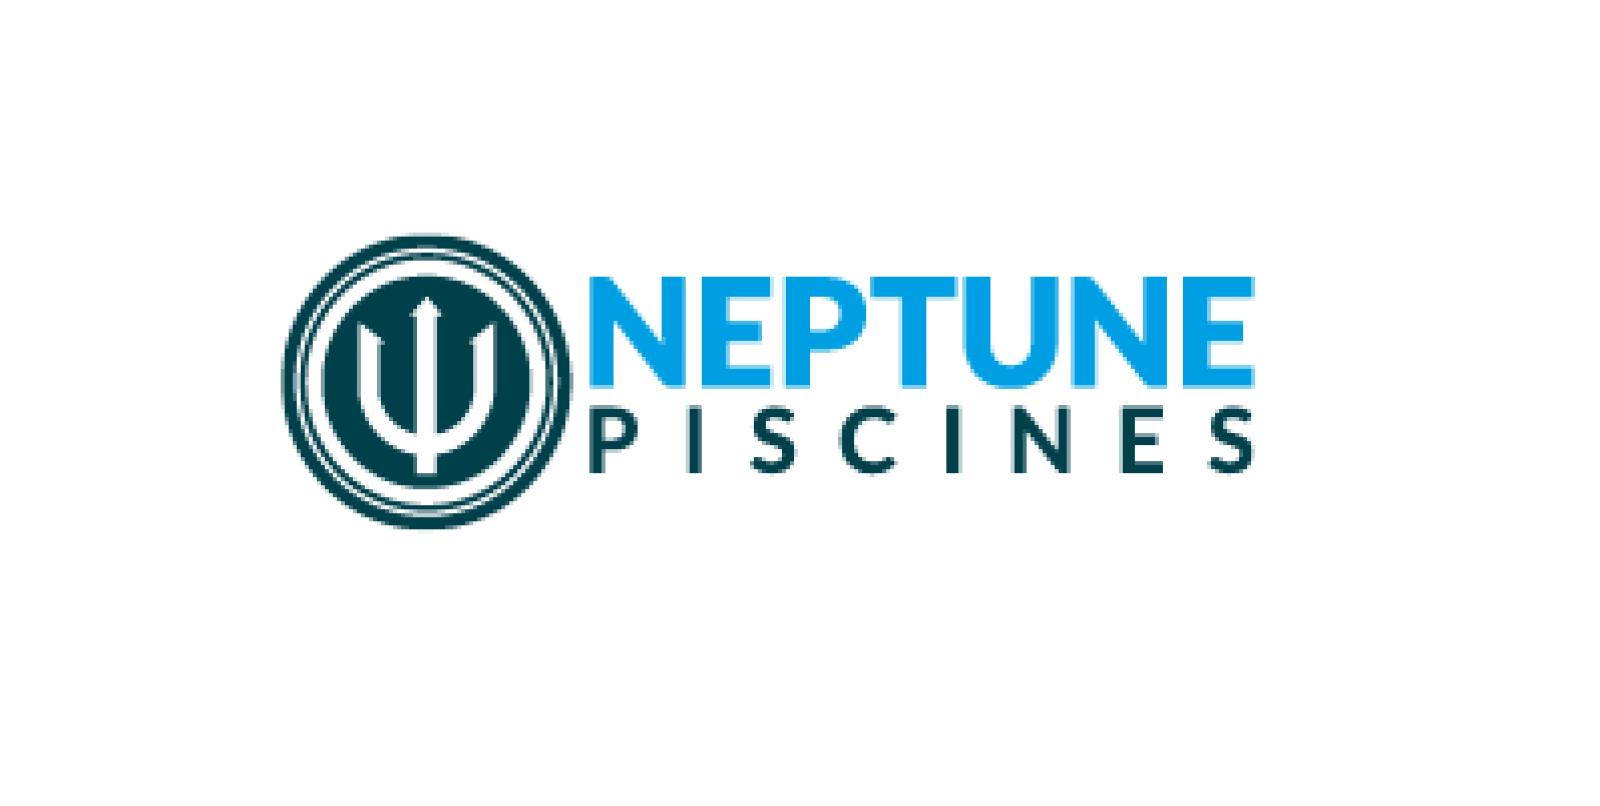 Neptune Piscine Vente Et Pose De Piscine Martigues - Satt pour Neptune Piscine